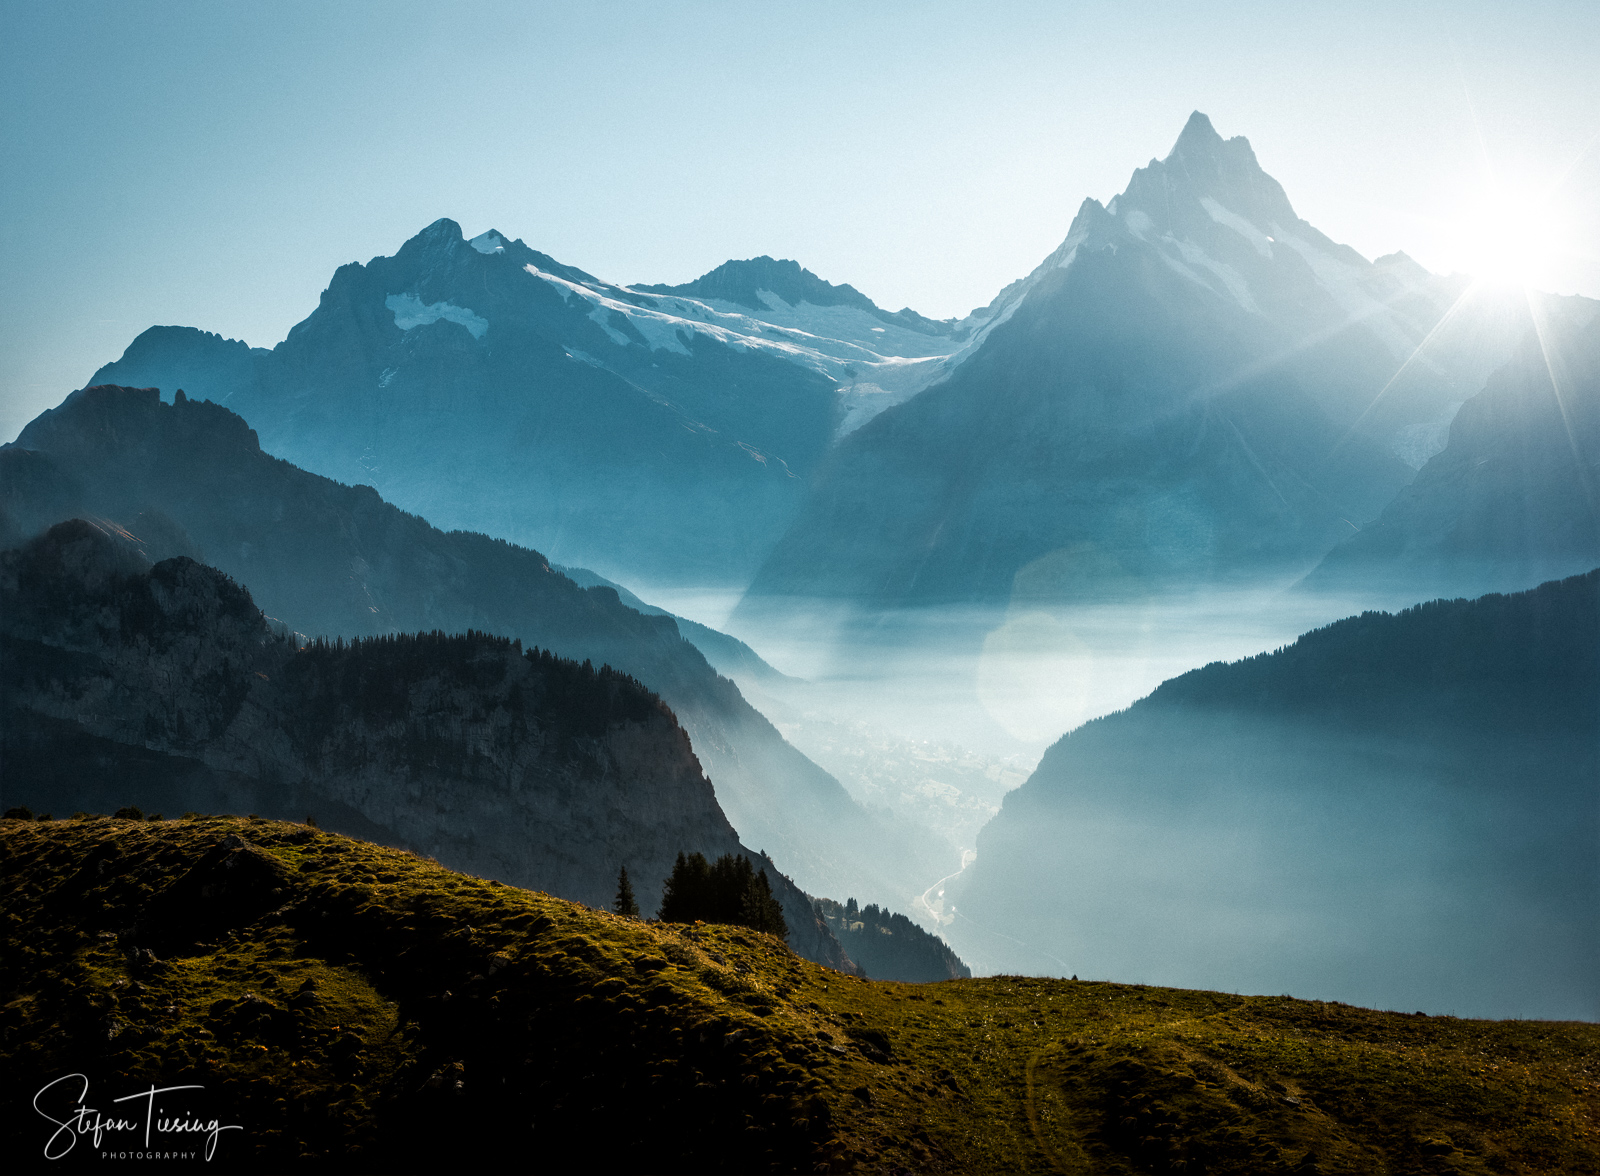 View over Grindelwald, Switzerland